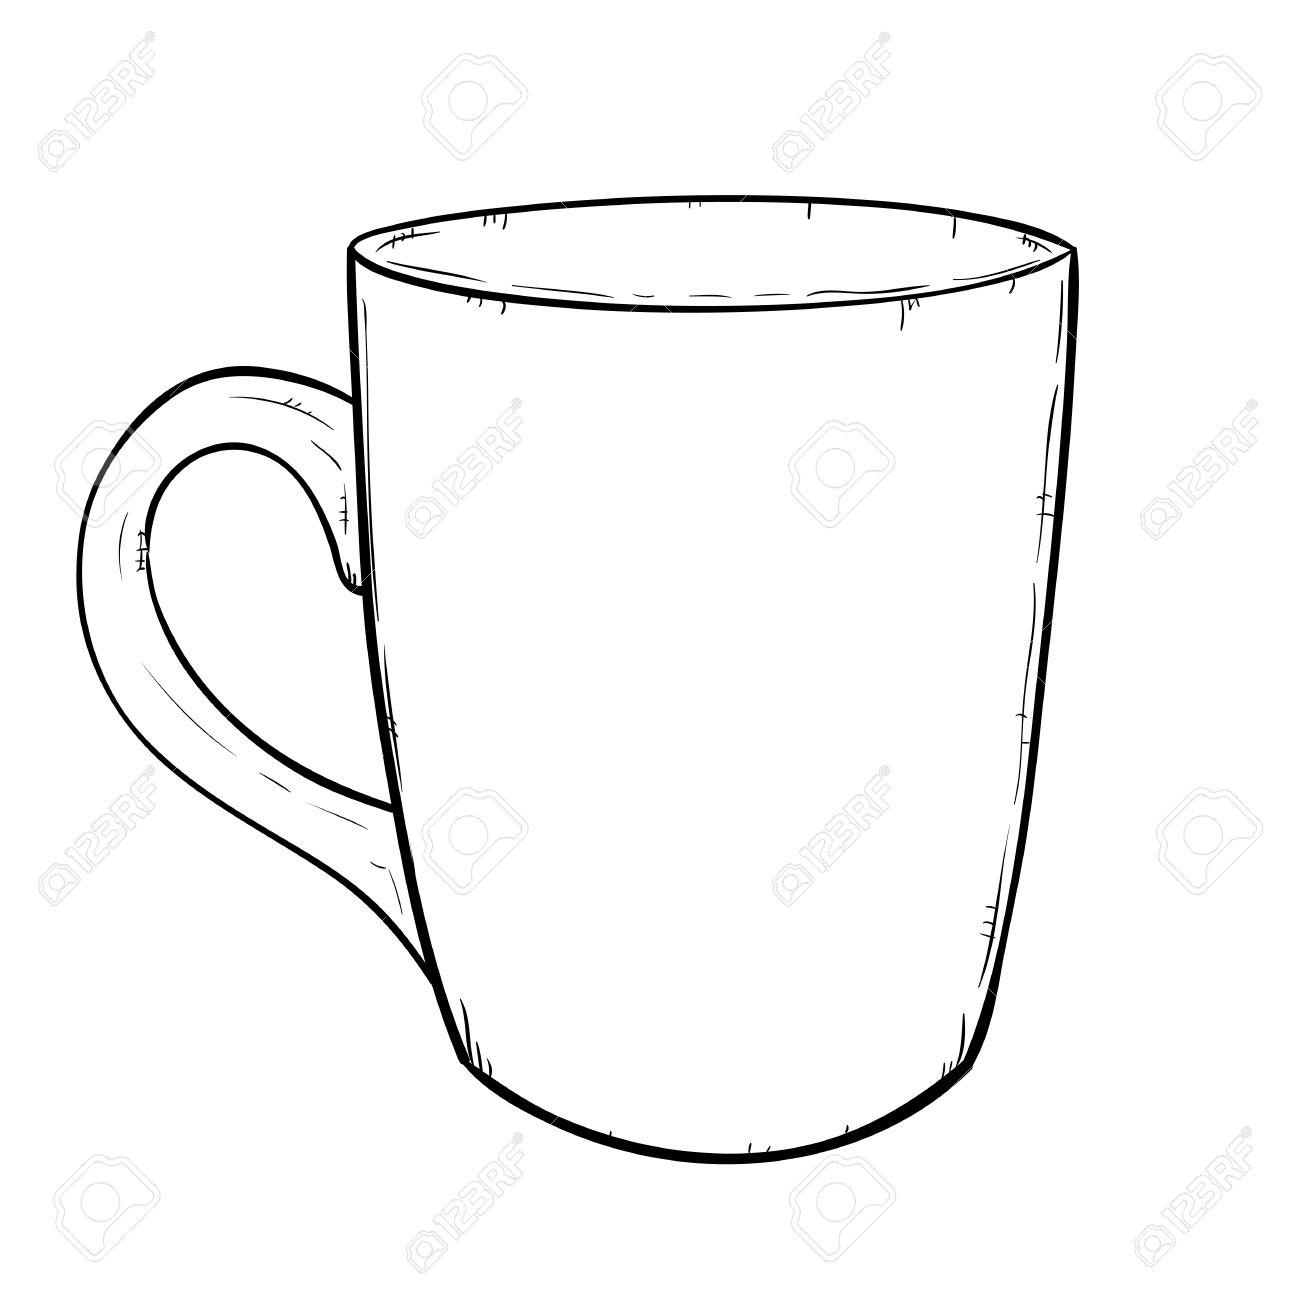 1300x1300 Vector Sketch Illustration Of Cup Royalty Free Cliparts, Vectors